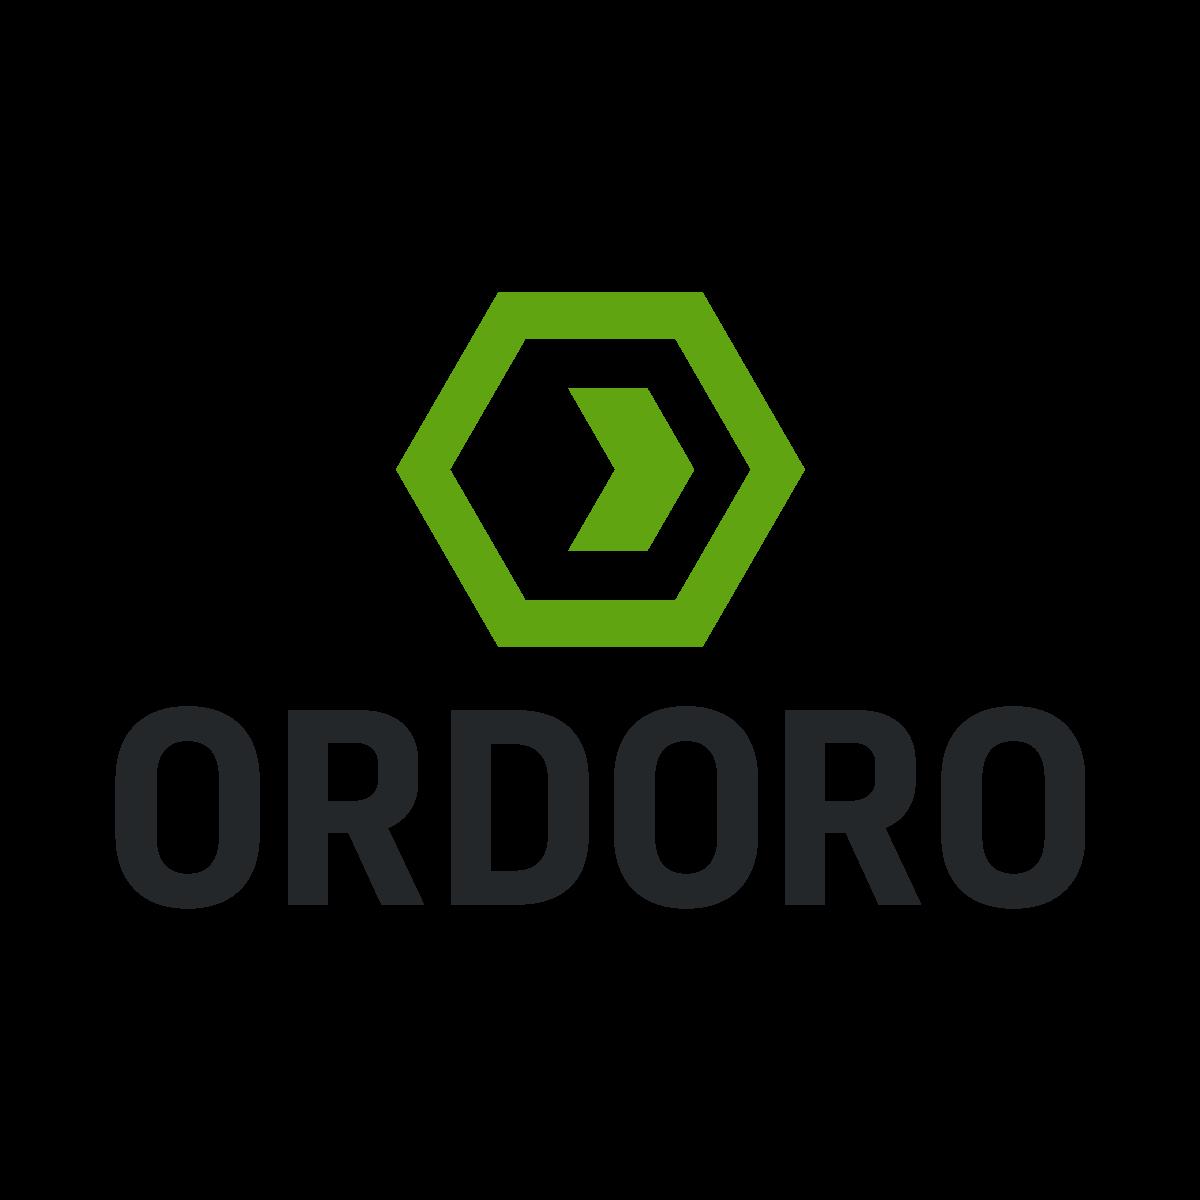 Ordoro